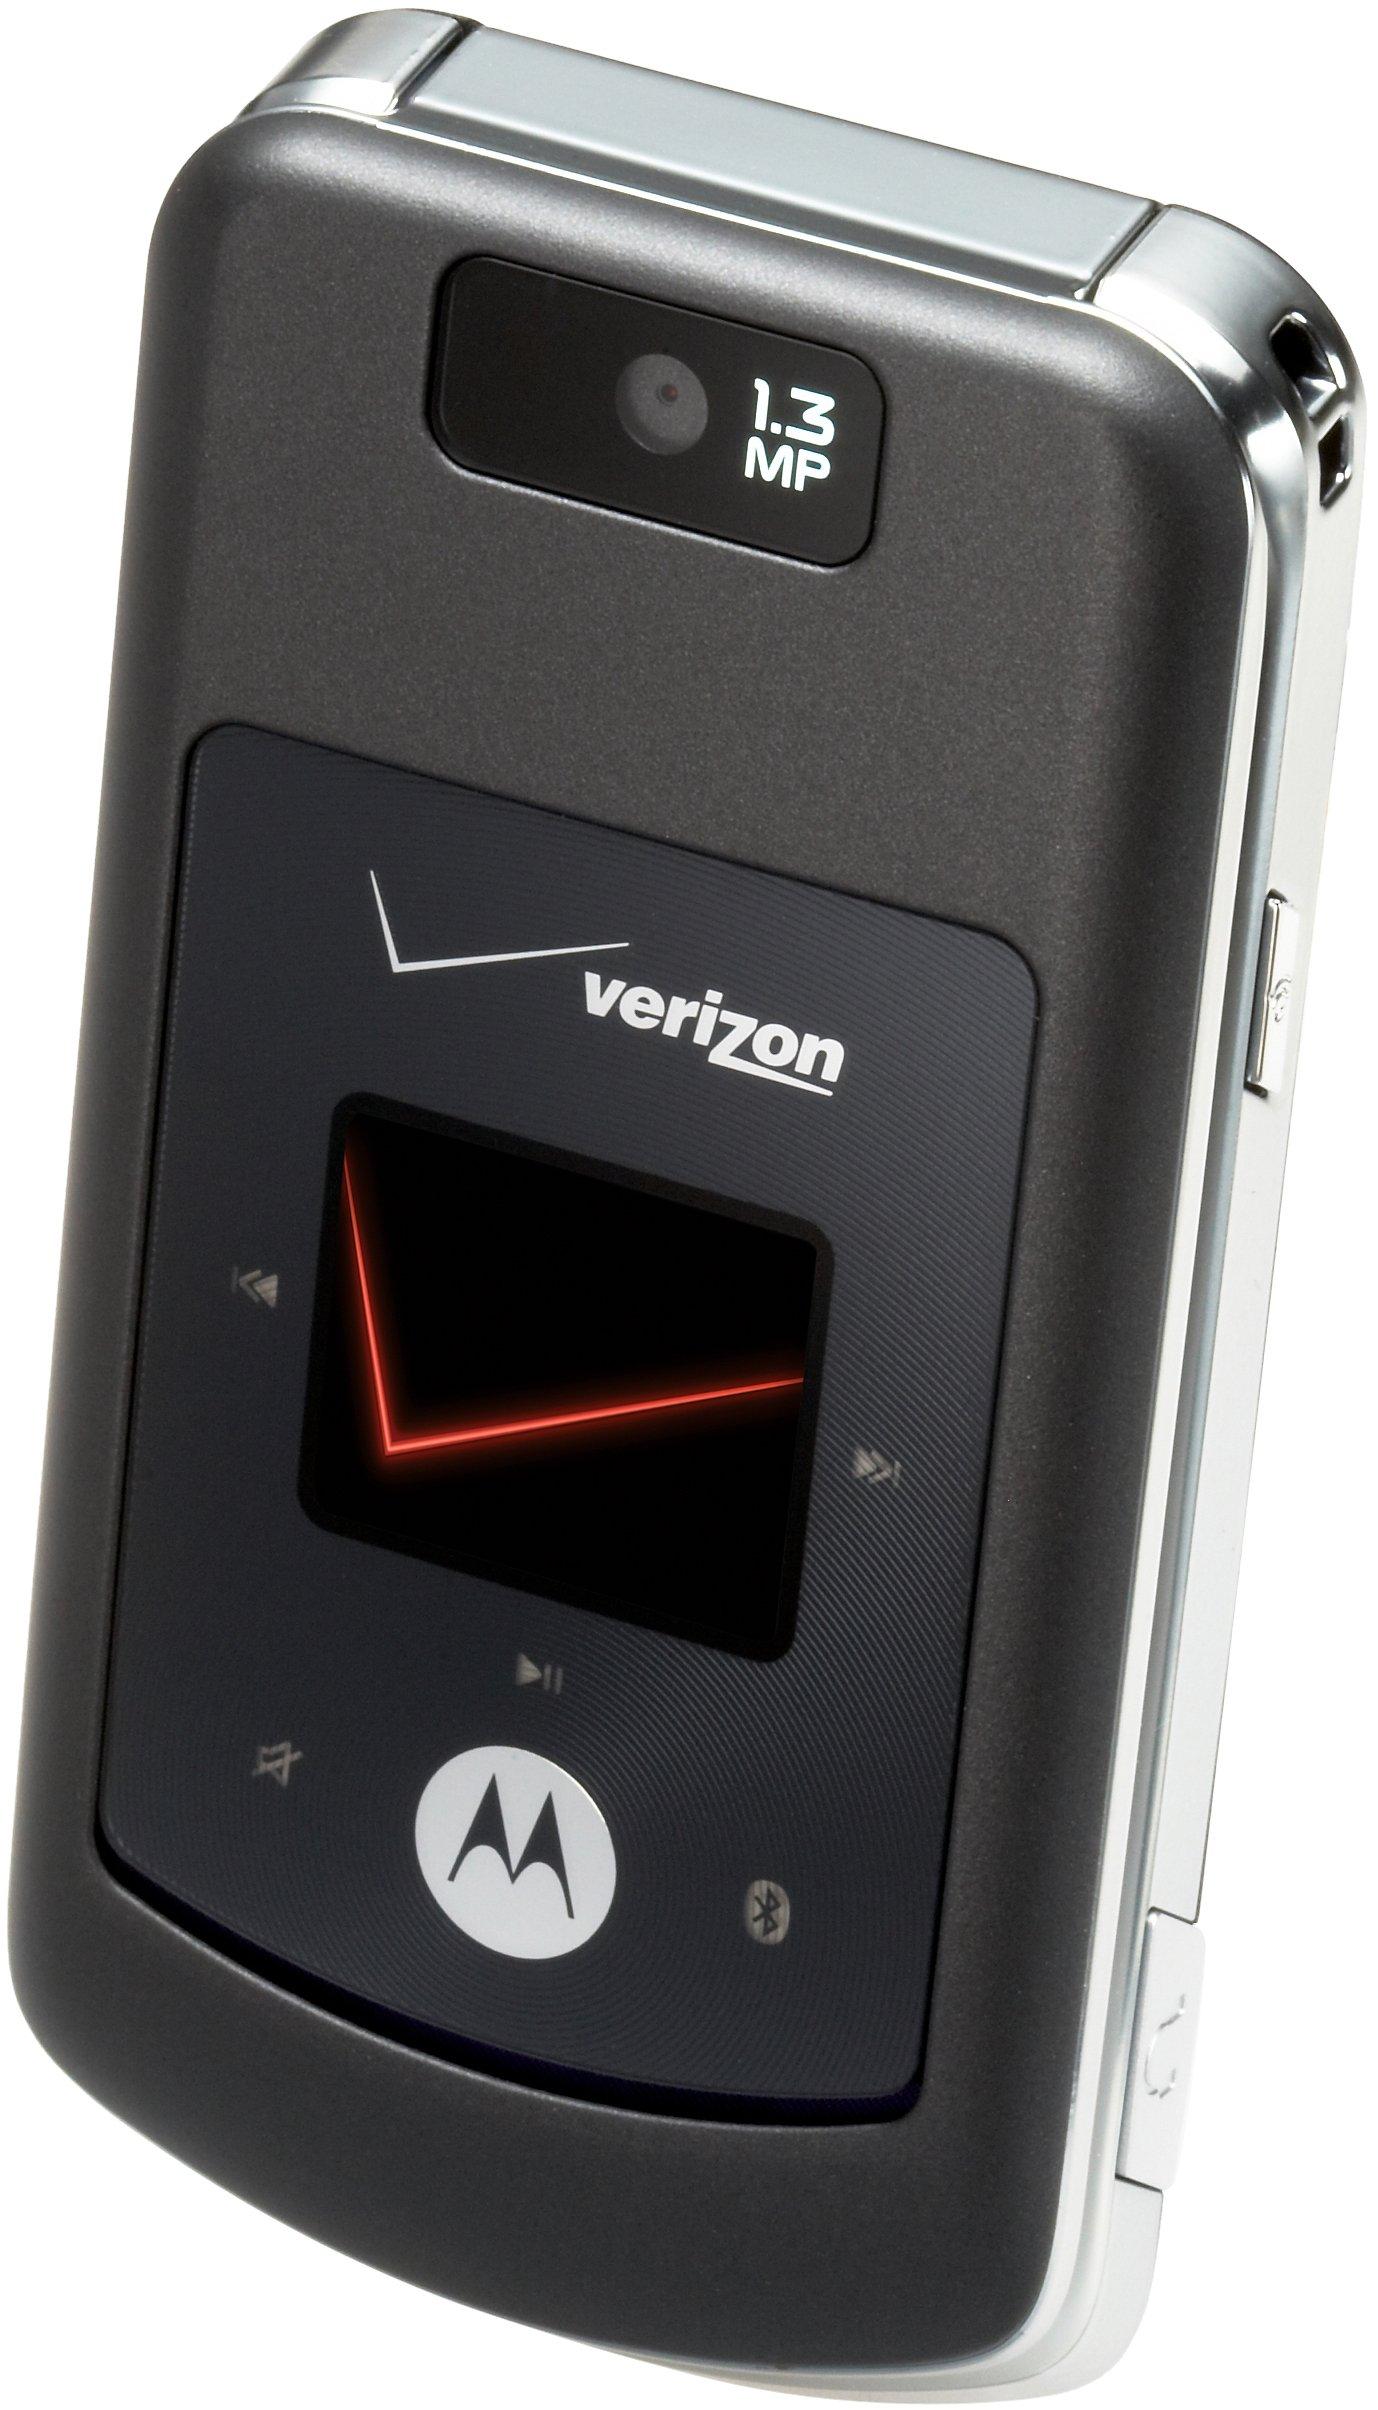 Motorola w755 Phone, Black (Verizon Wireless)